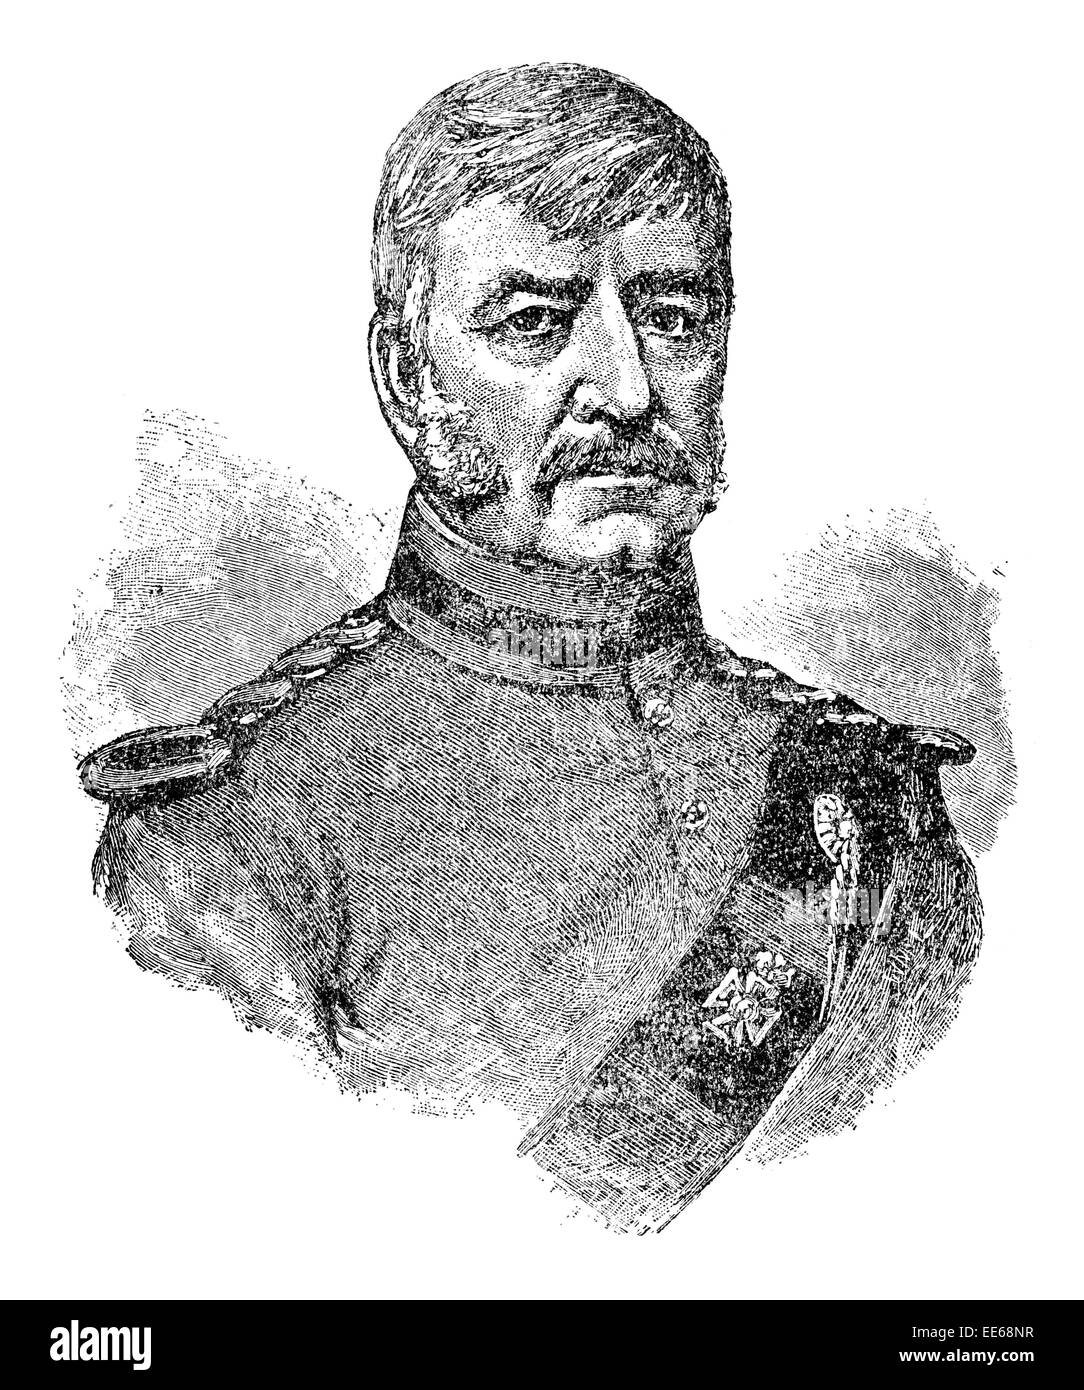 Edmund Lockyer 21 January 1784 10 June 1860 British soldier explorer Australia brig Amity portrait military army - Stock Image